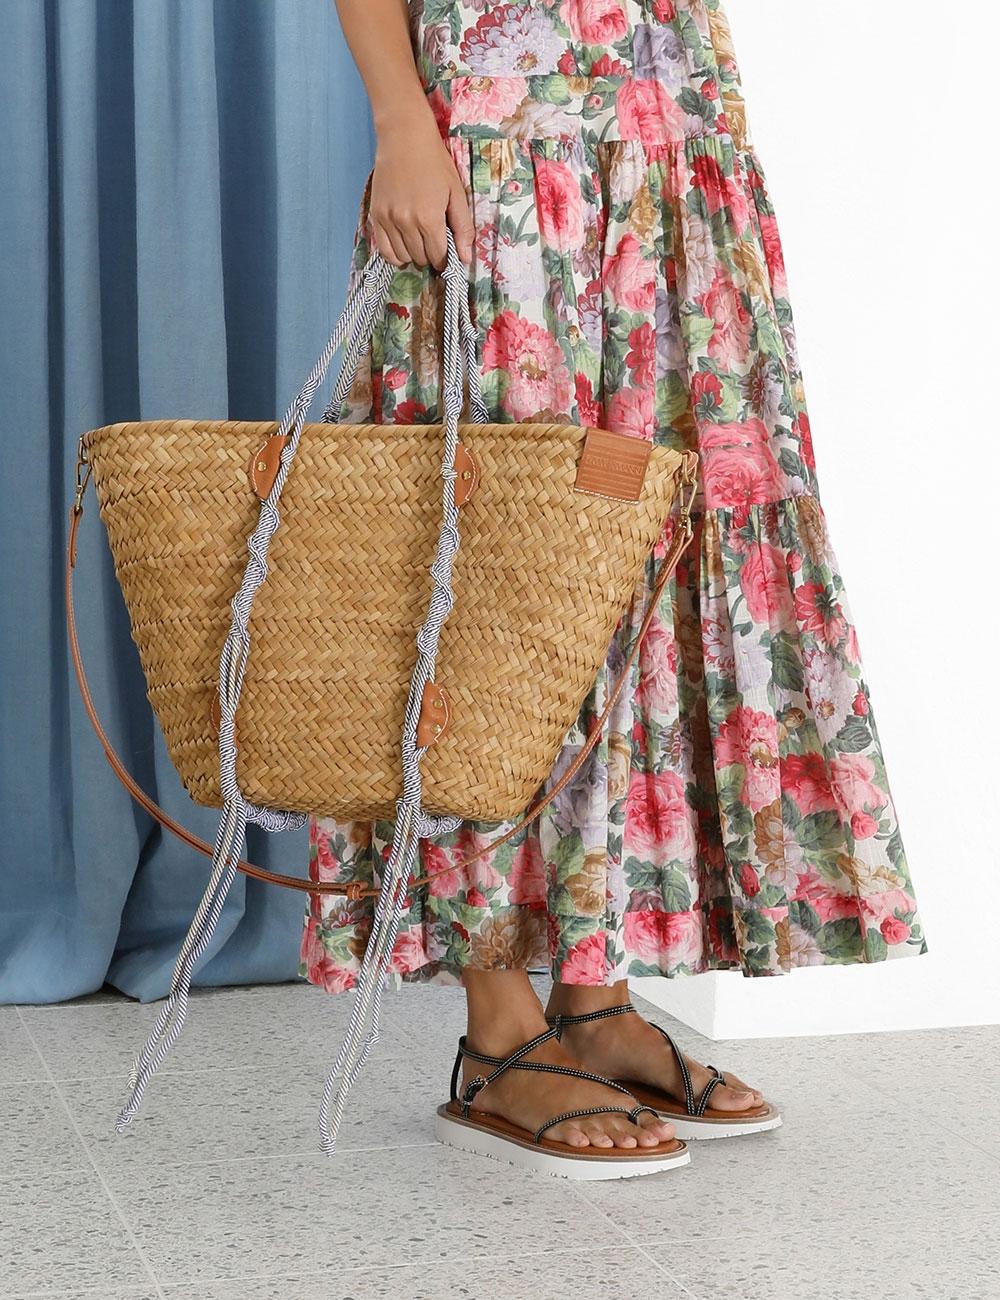 Macrame Woven Basket